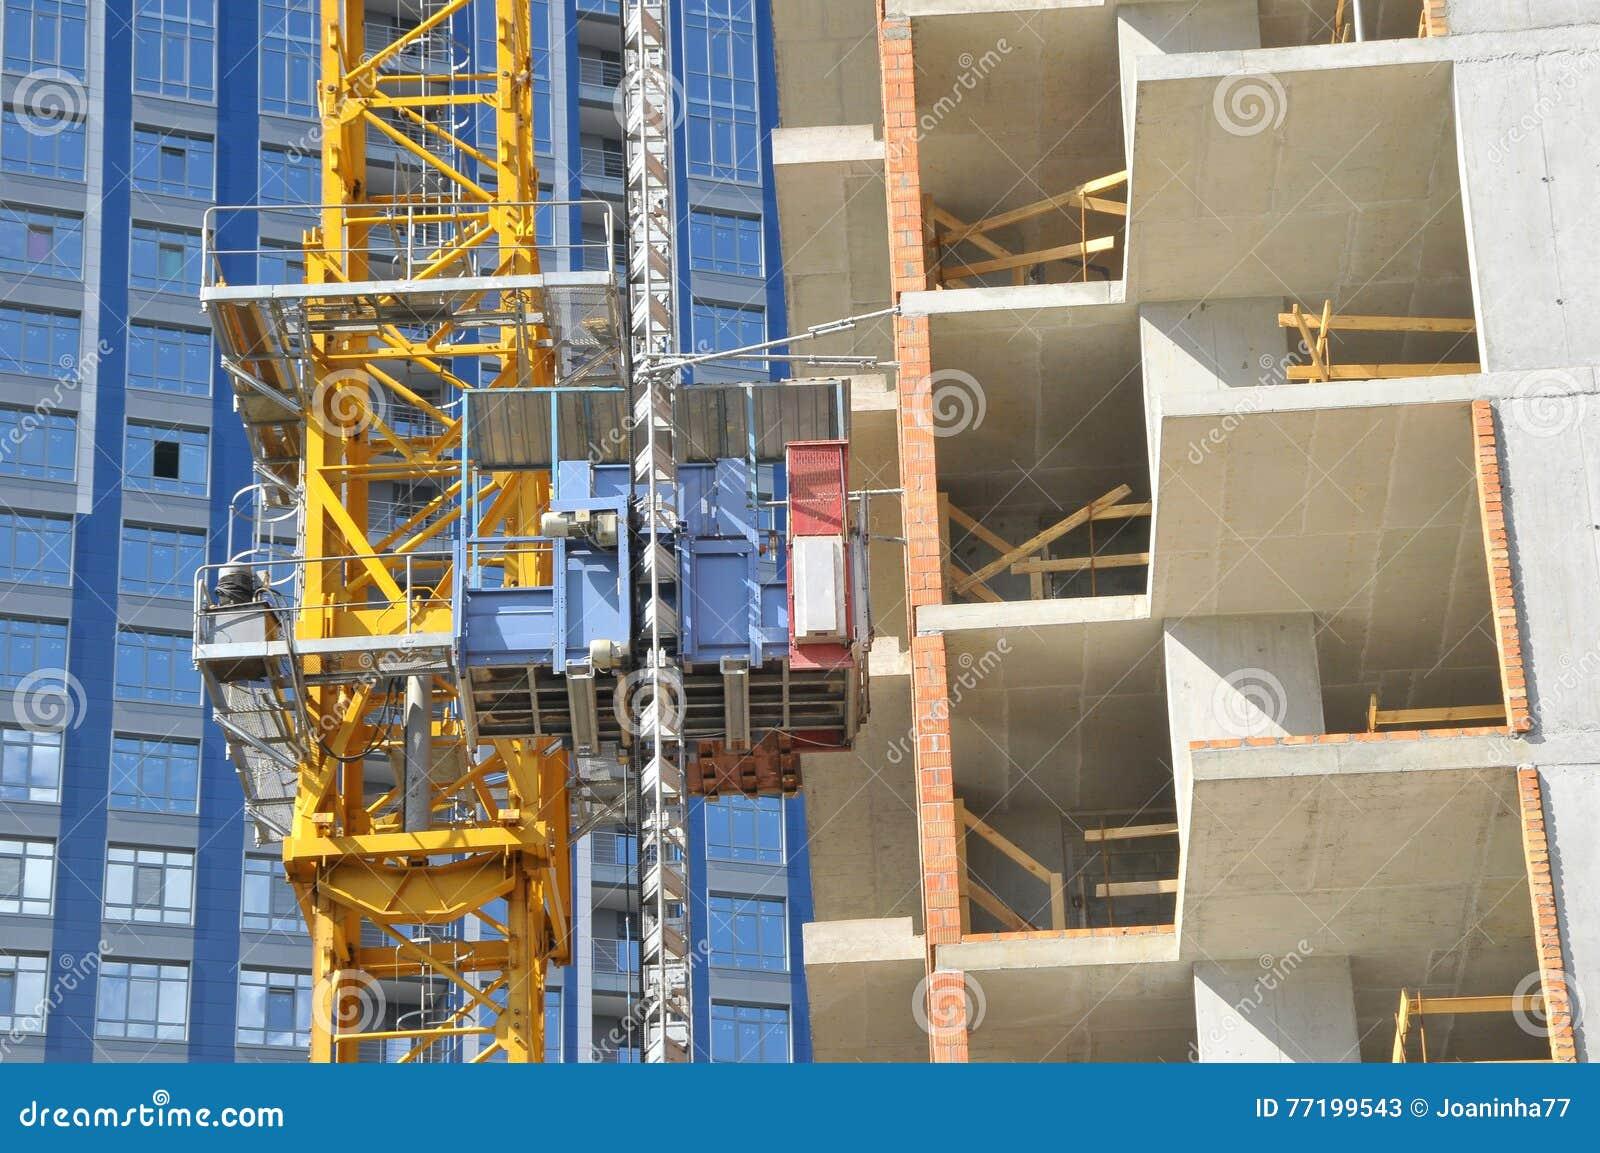 The technology or art of high rise apartment construction using crane, lift, metal beam, brick, metal ladder